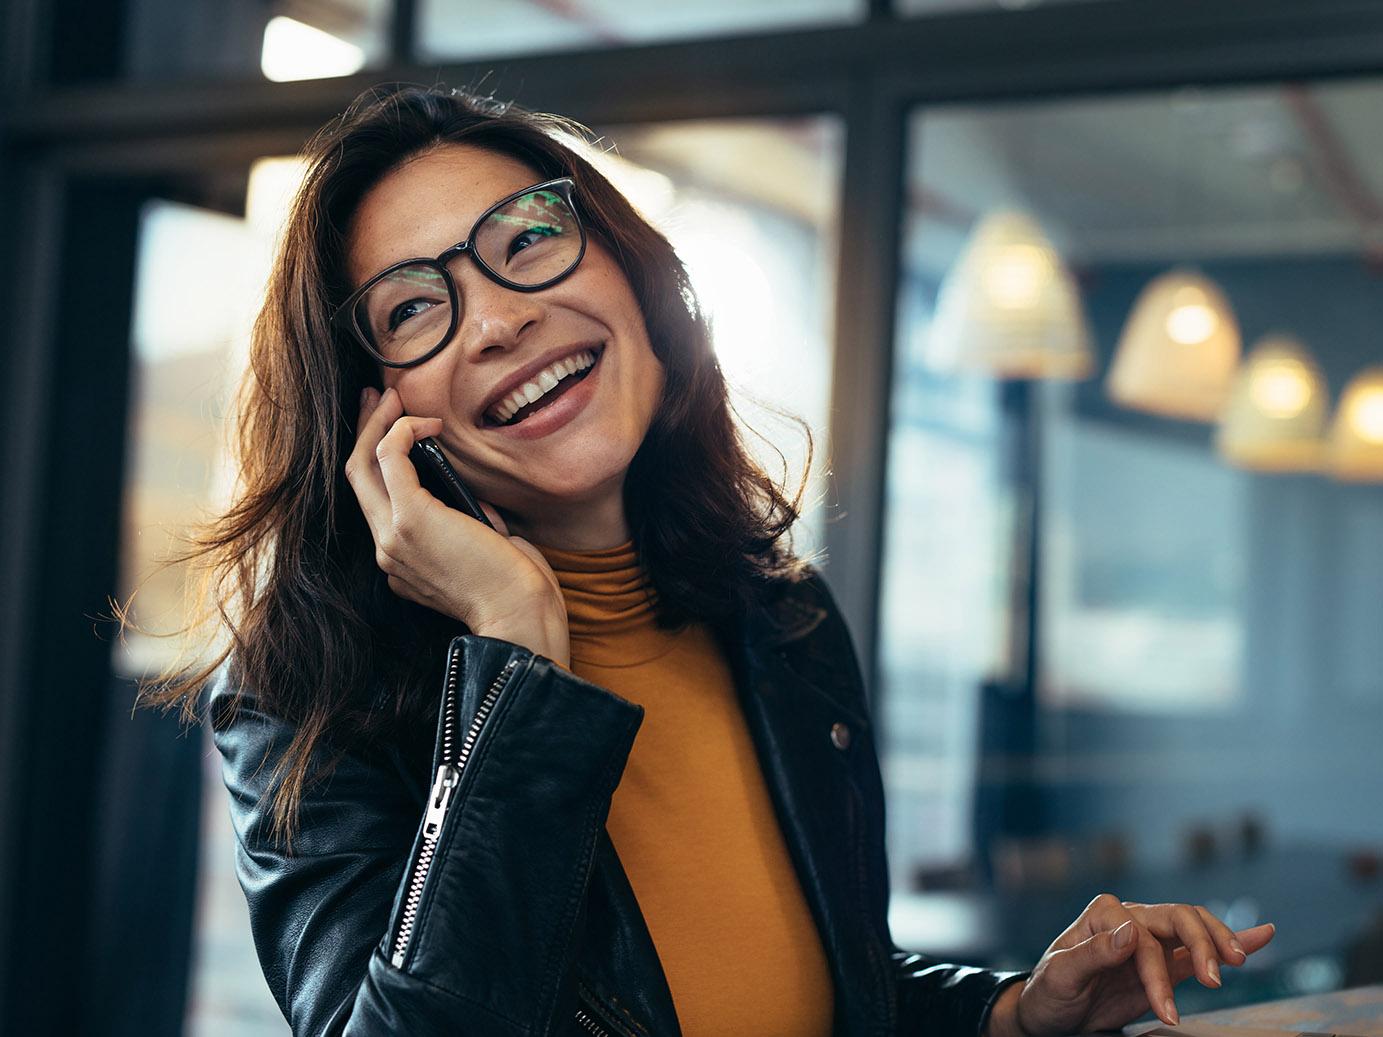 Woman smiling & using phone